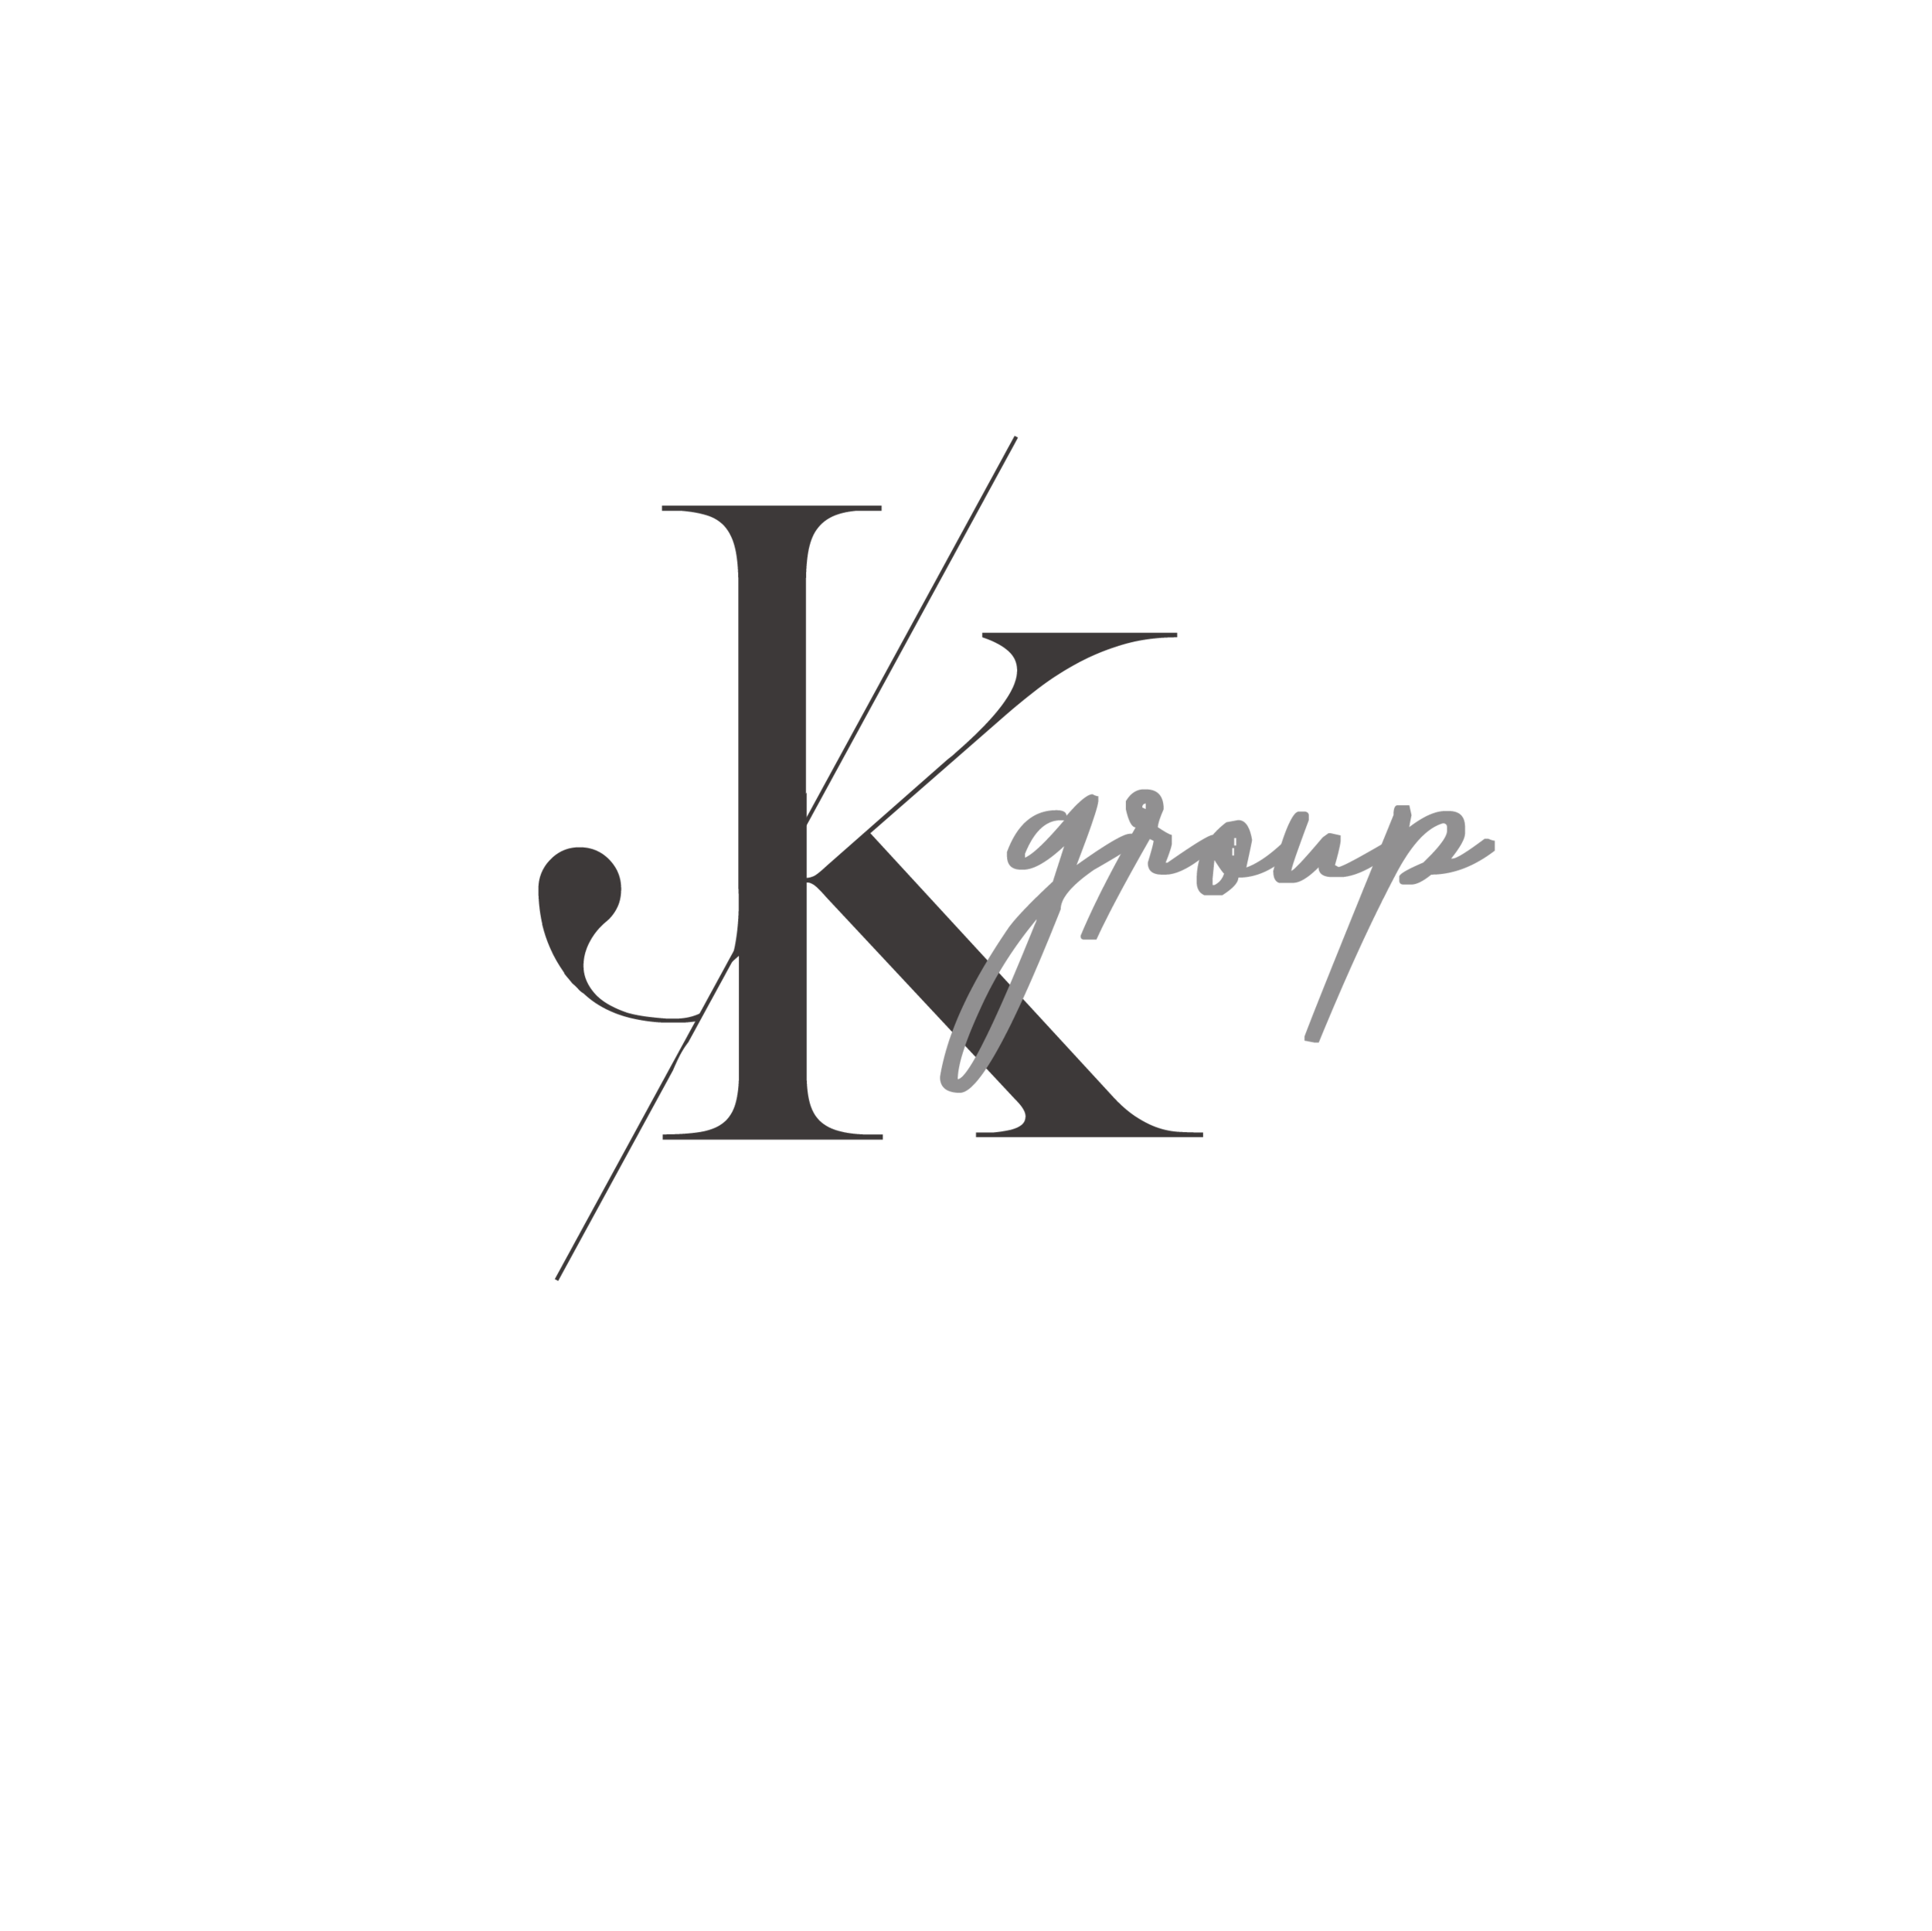 JKG_LOGOS_FINAL__JK_Group_icon_colored.png